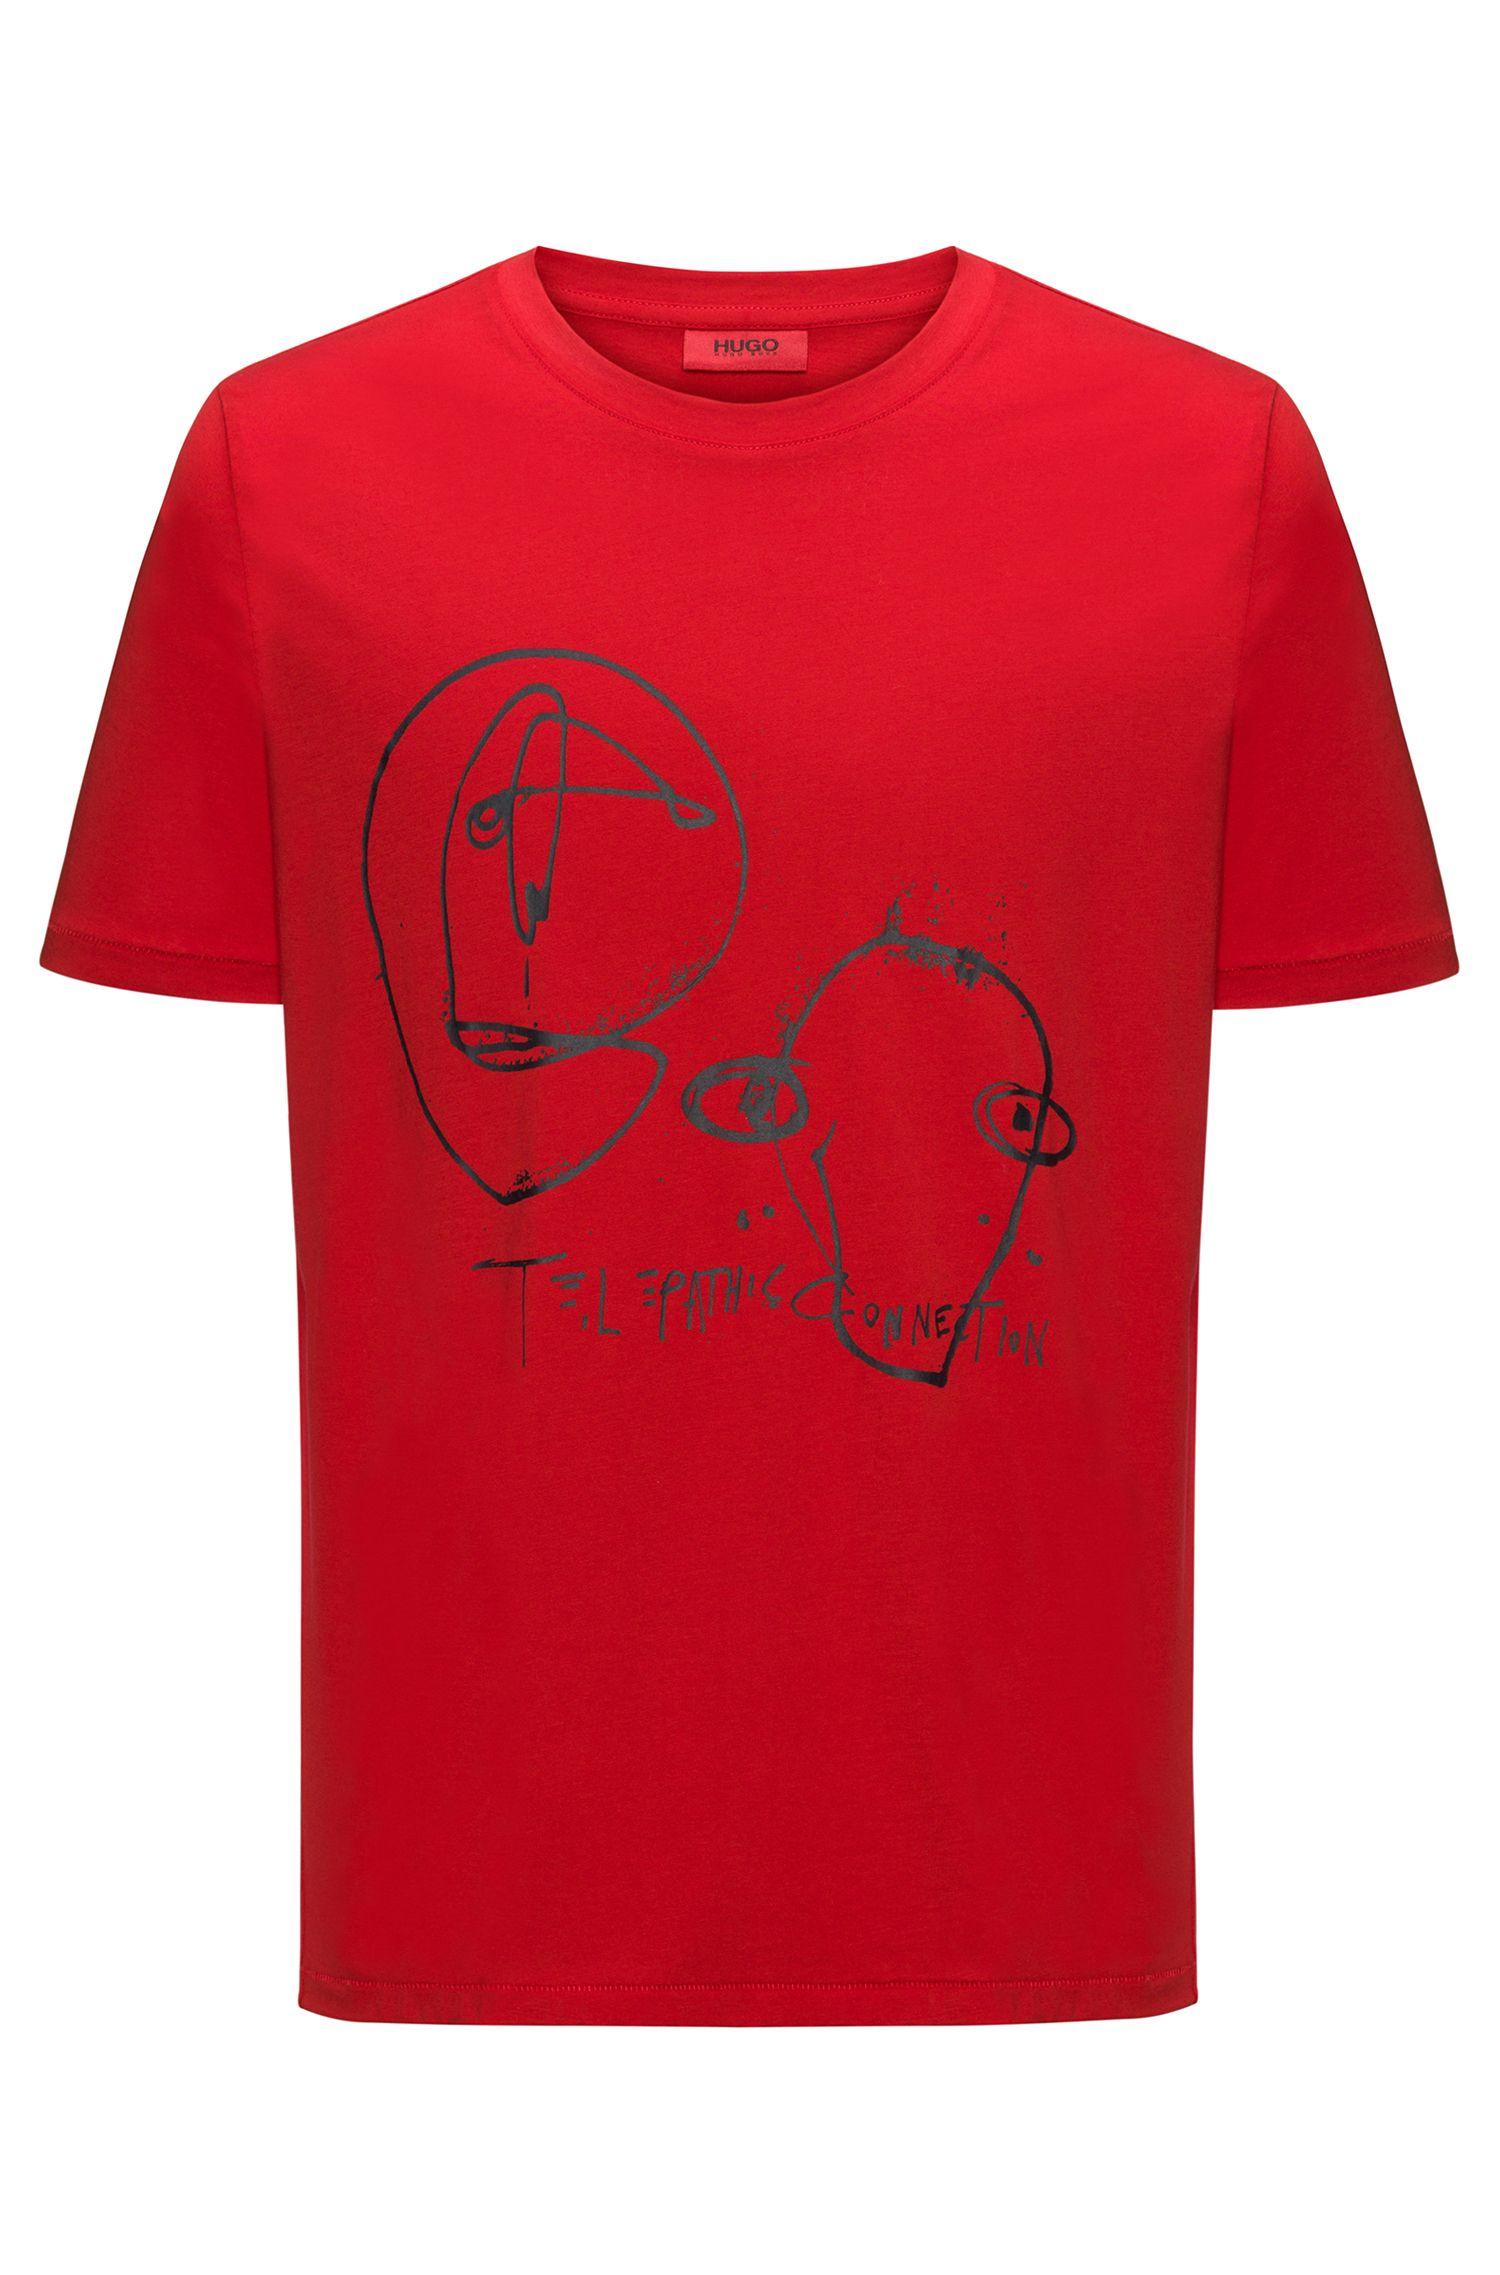 Cotton T-shirt with rubberised epigram print